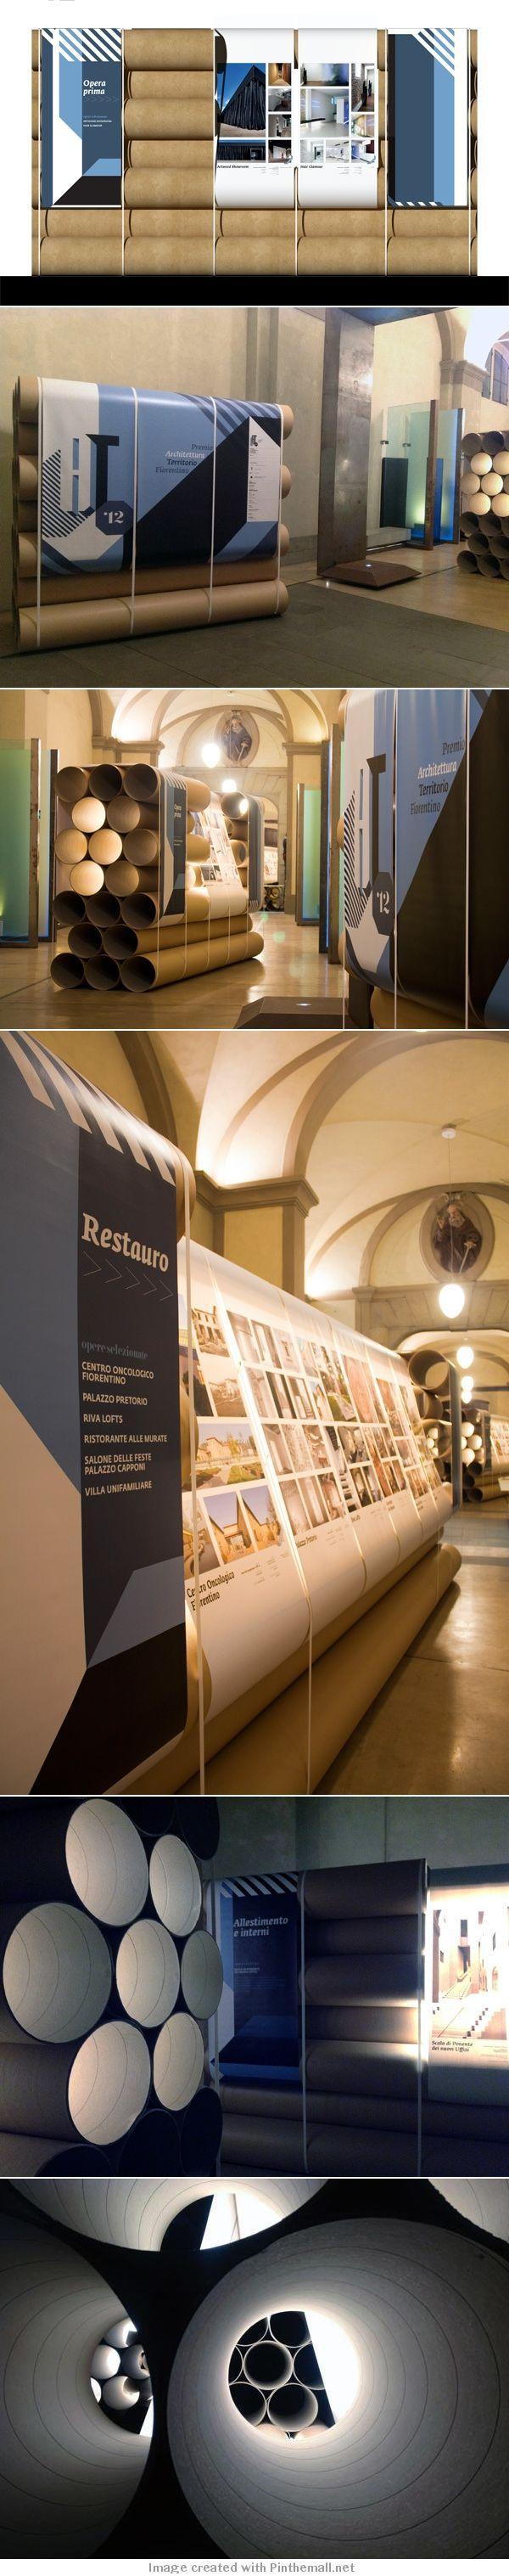 AT'12 exhibition. / #architecture #art #direction #exhibition #design #wideformat #largeformat #print